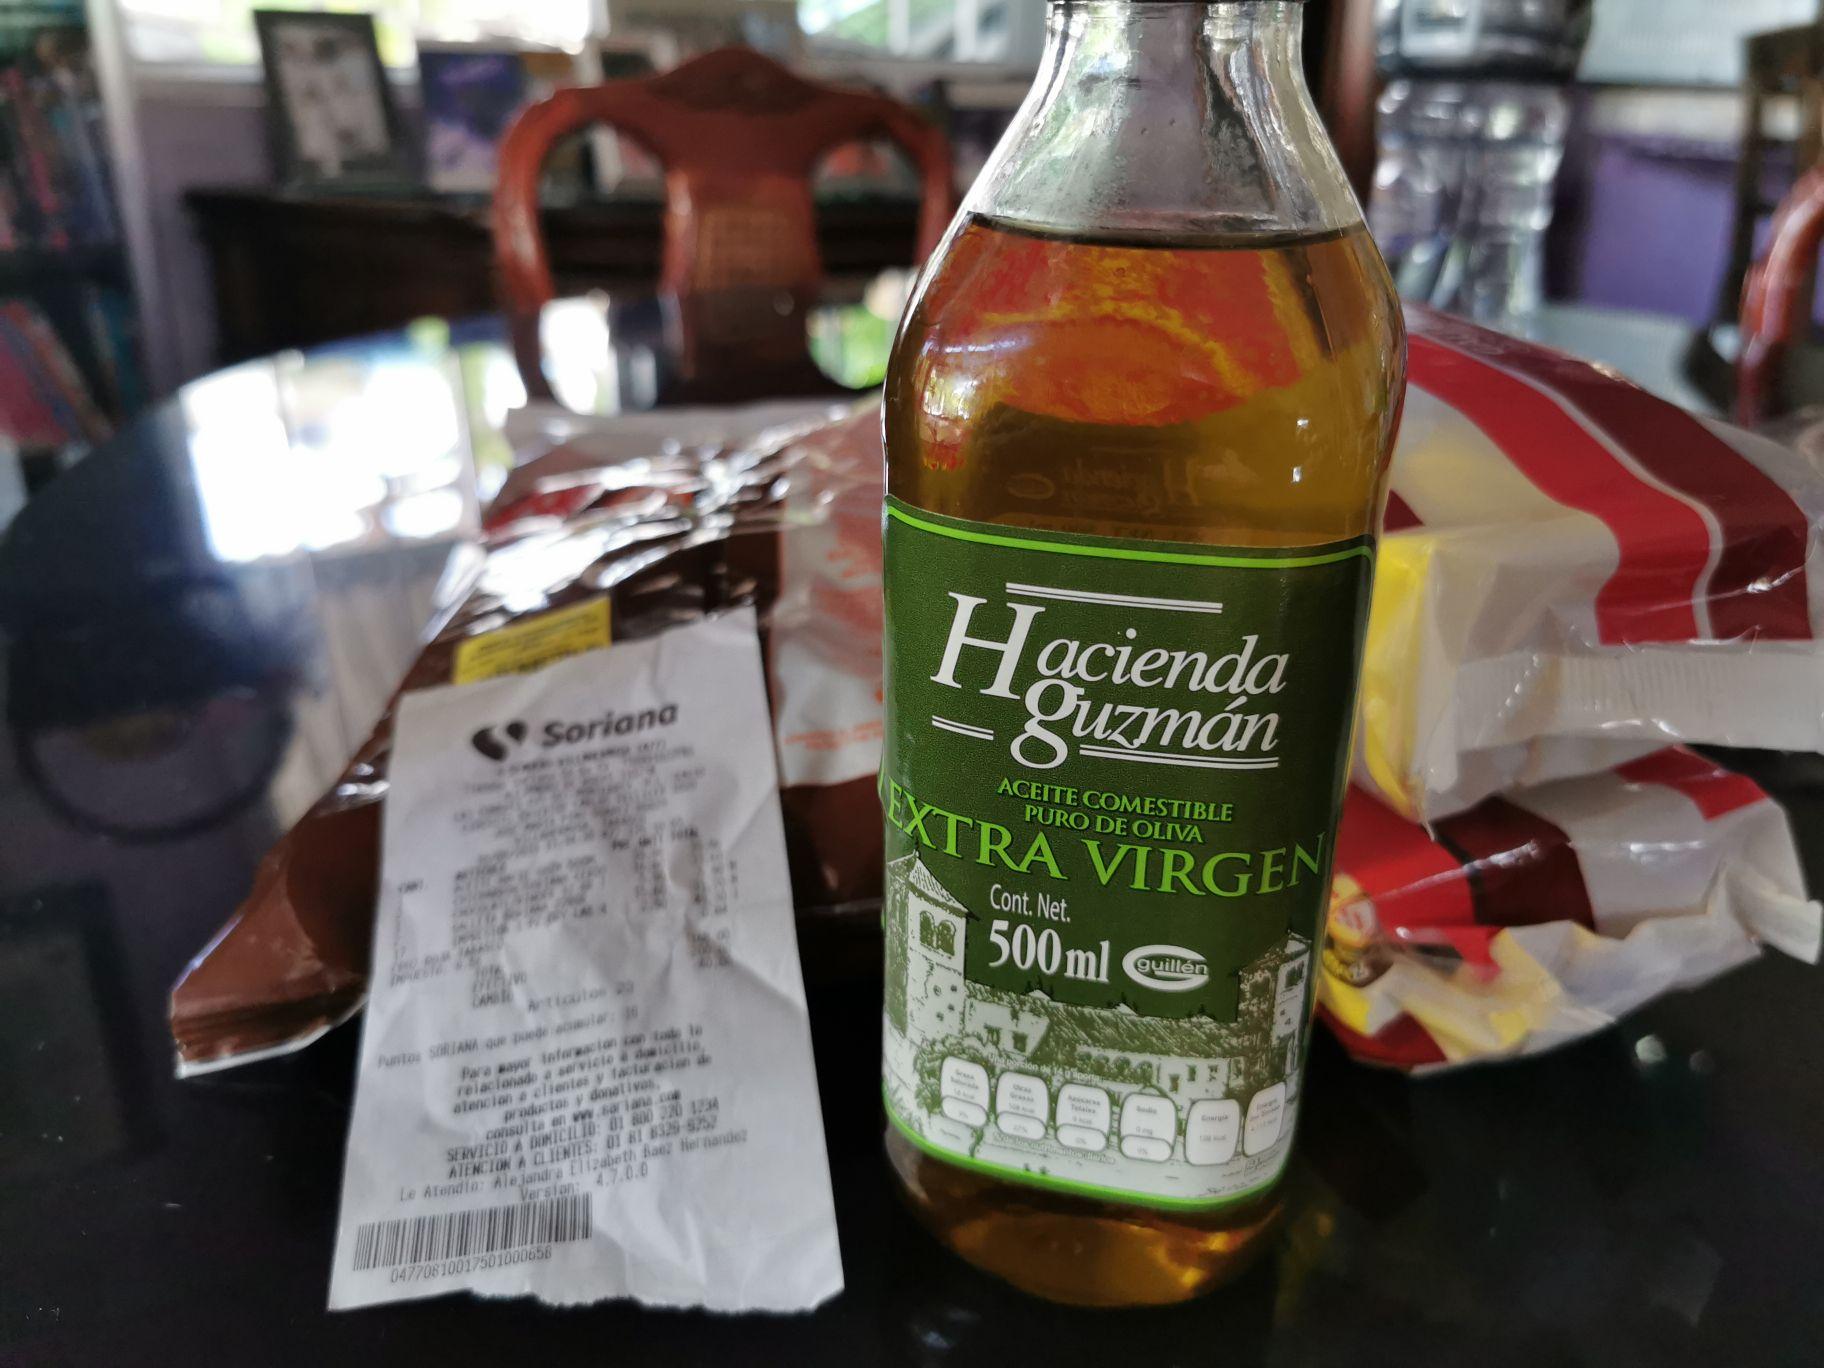 Soriana: Aceite de Oliva Extra virgen Español.